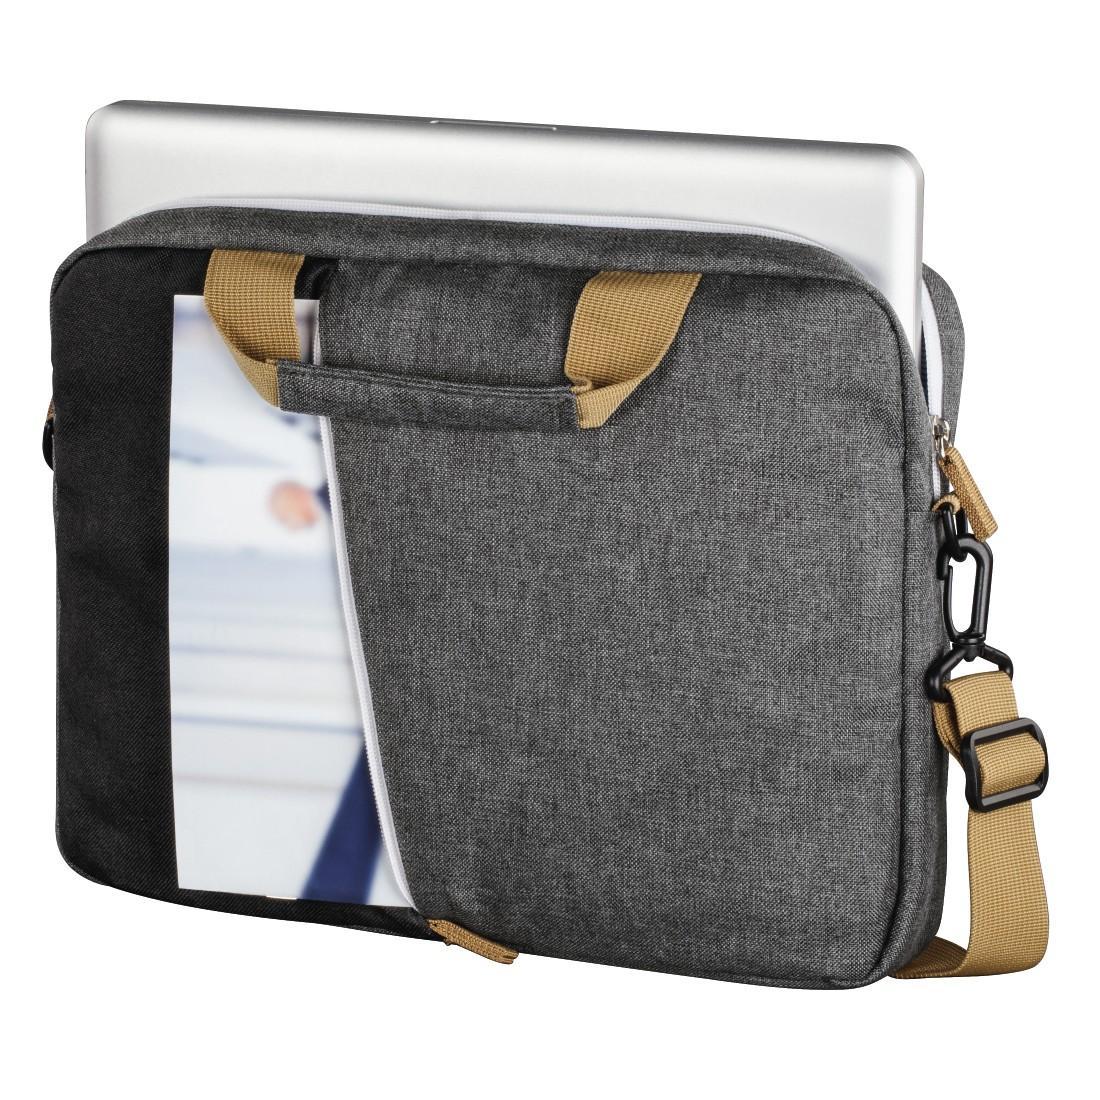 "Чанта за лаптоп HAMA Florence, до 40 см (15.6""), Черен/Сив"